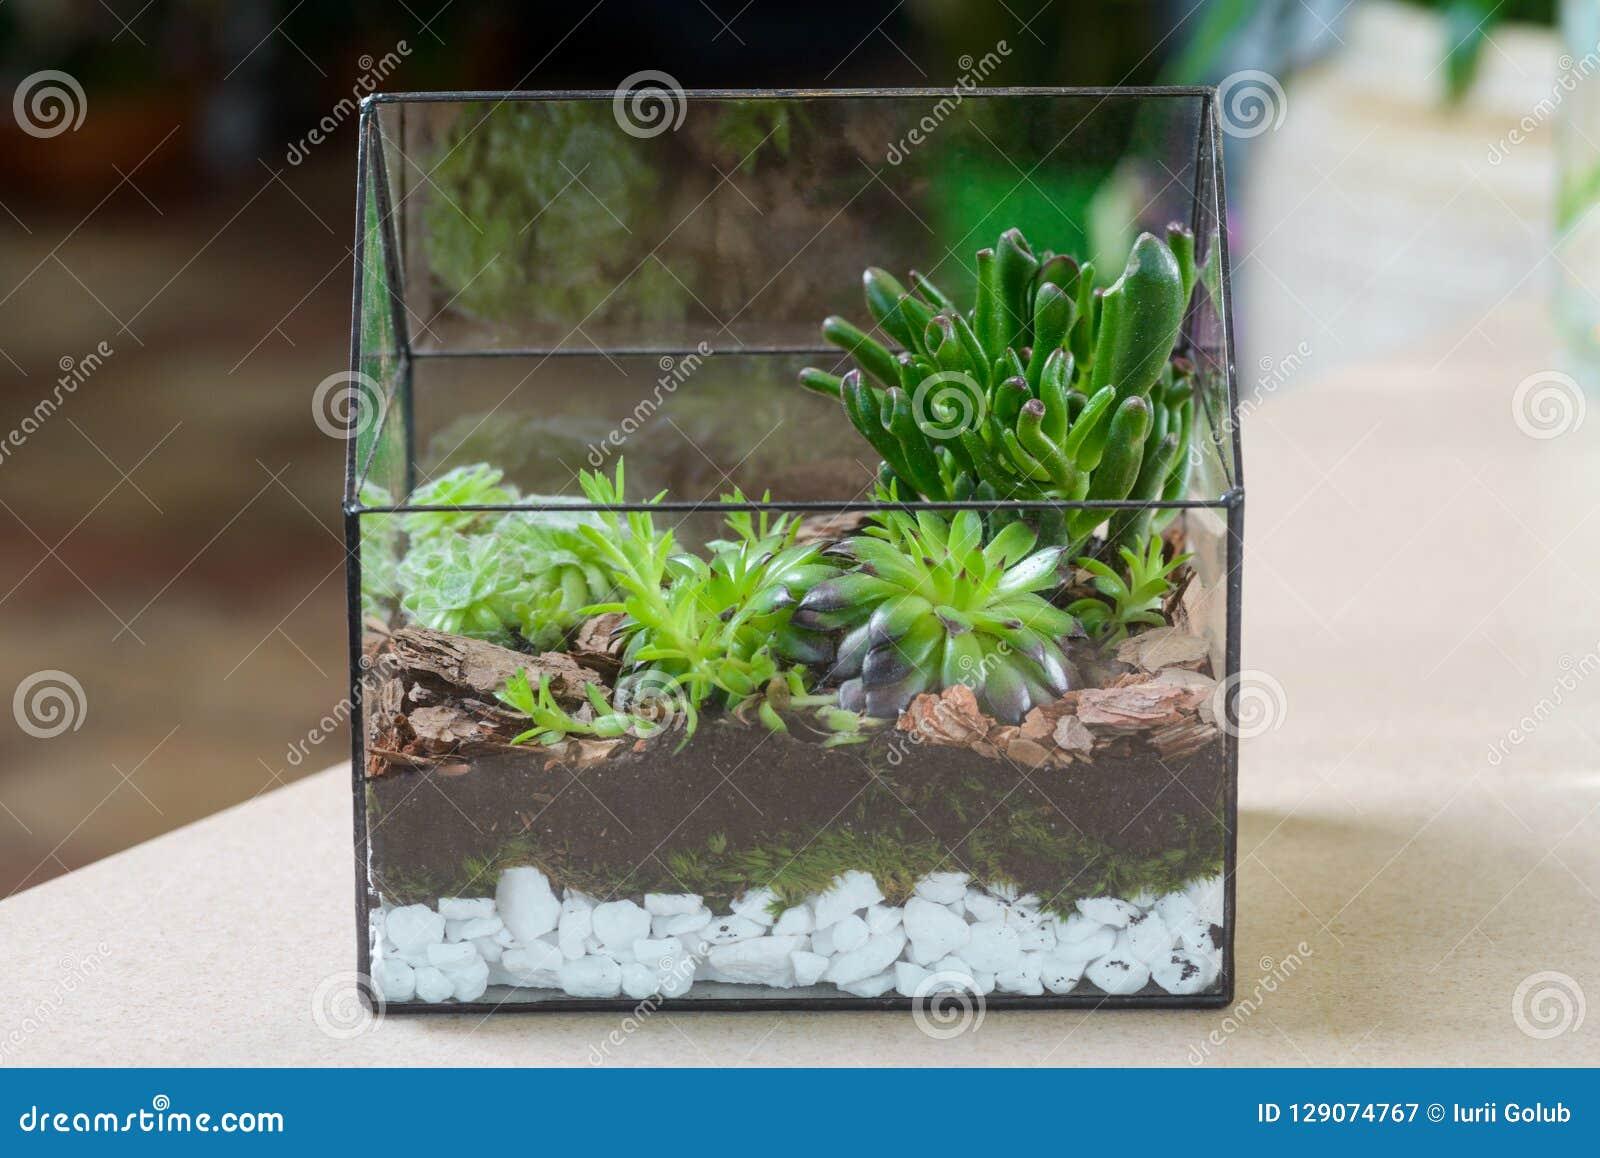 Terrarium With Succulent Plants Stock Image Image Of Focus Choice 129074767